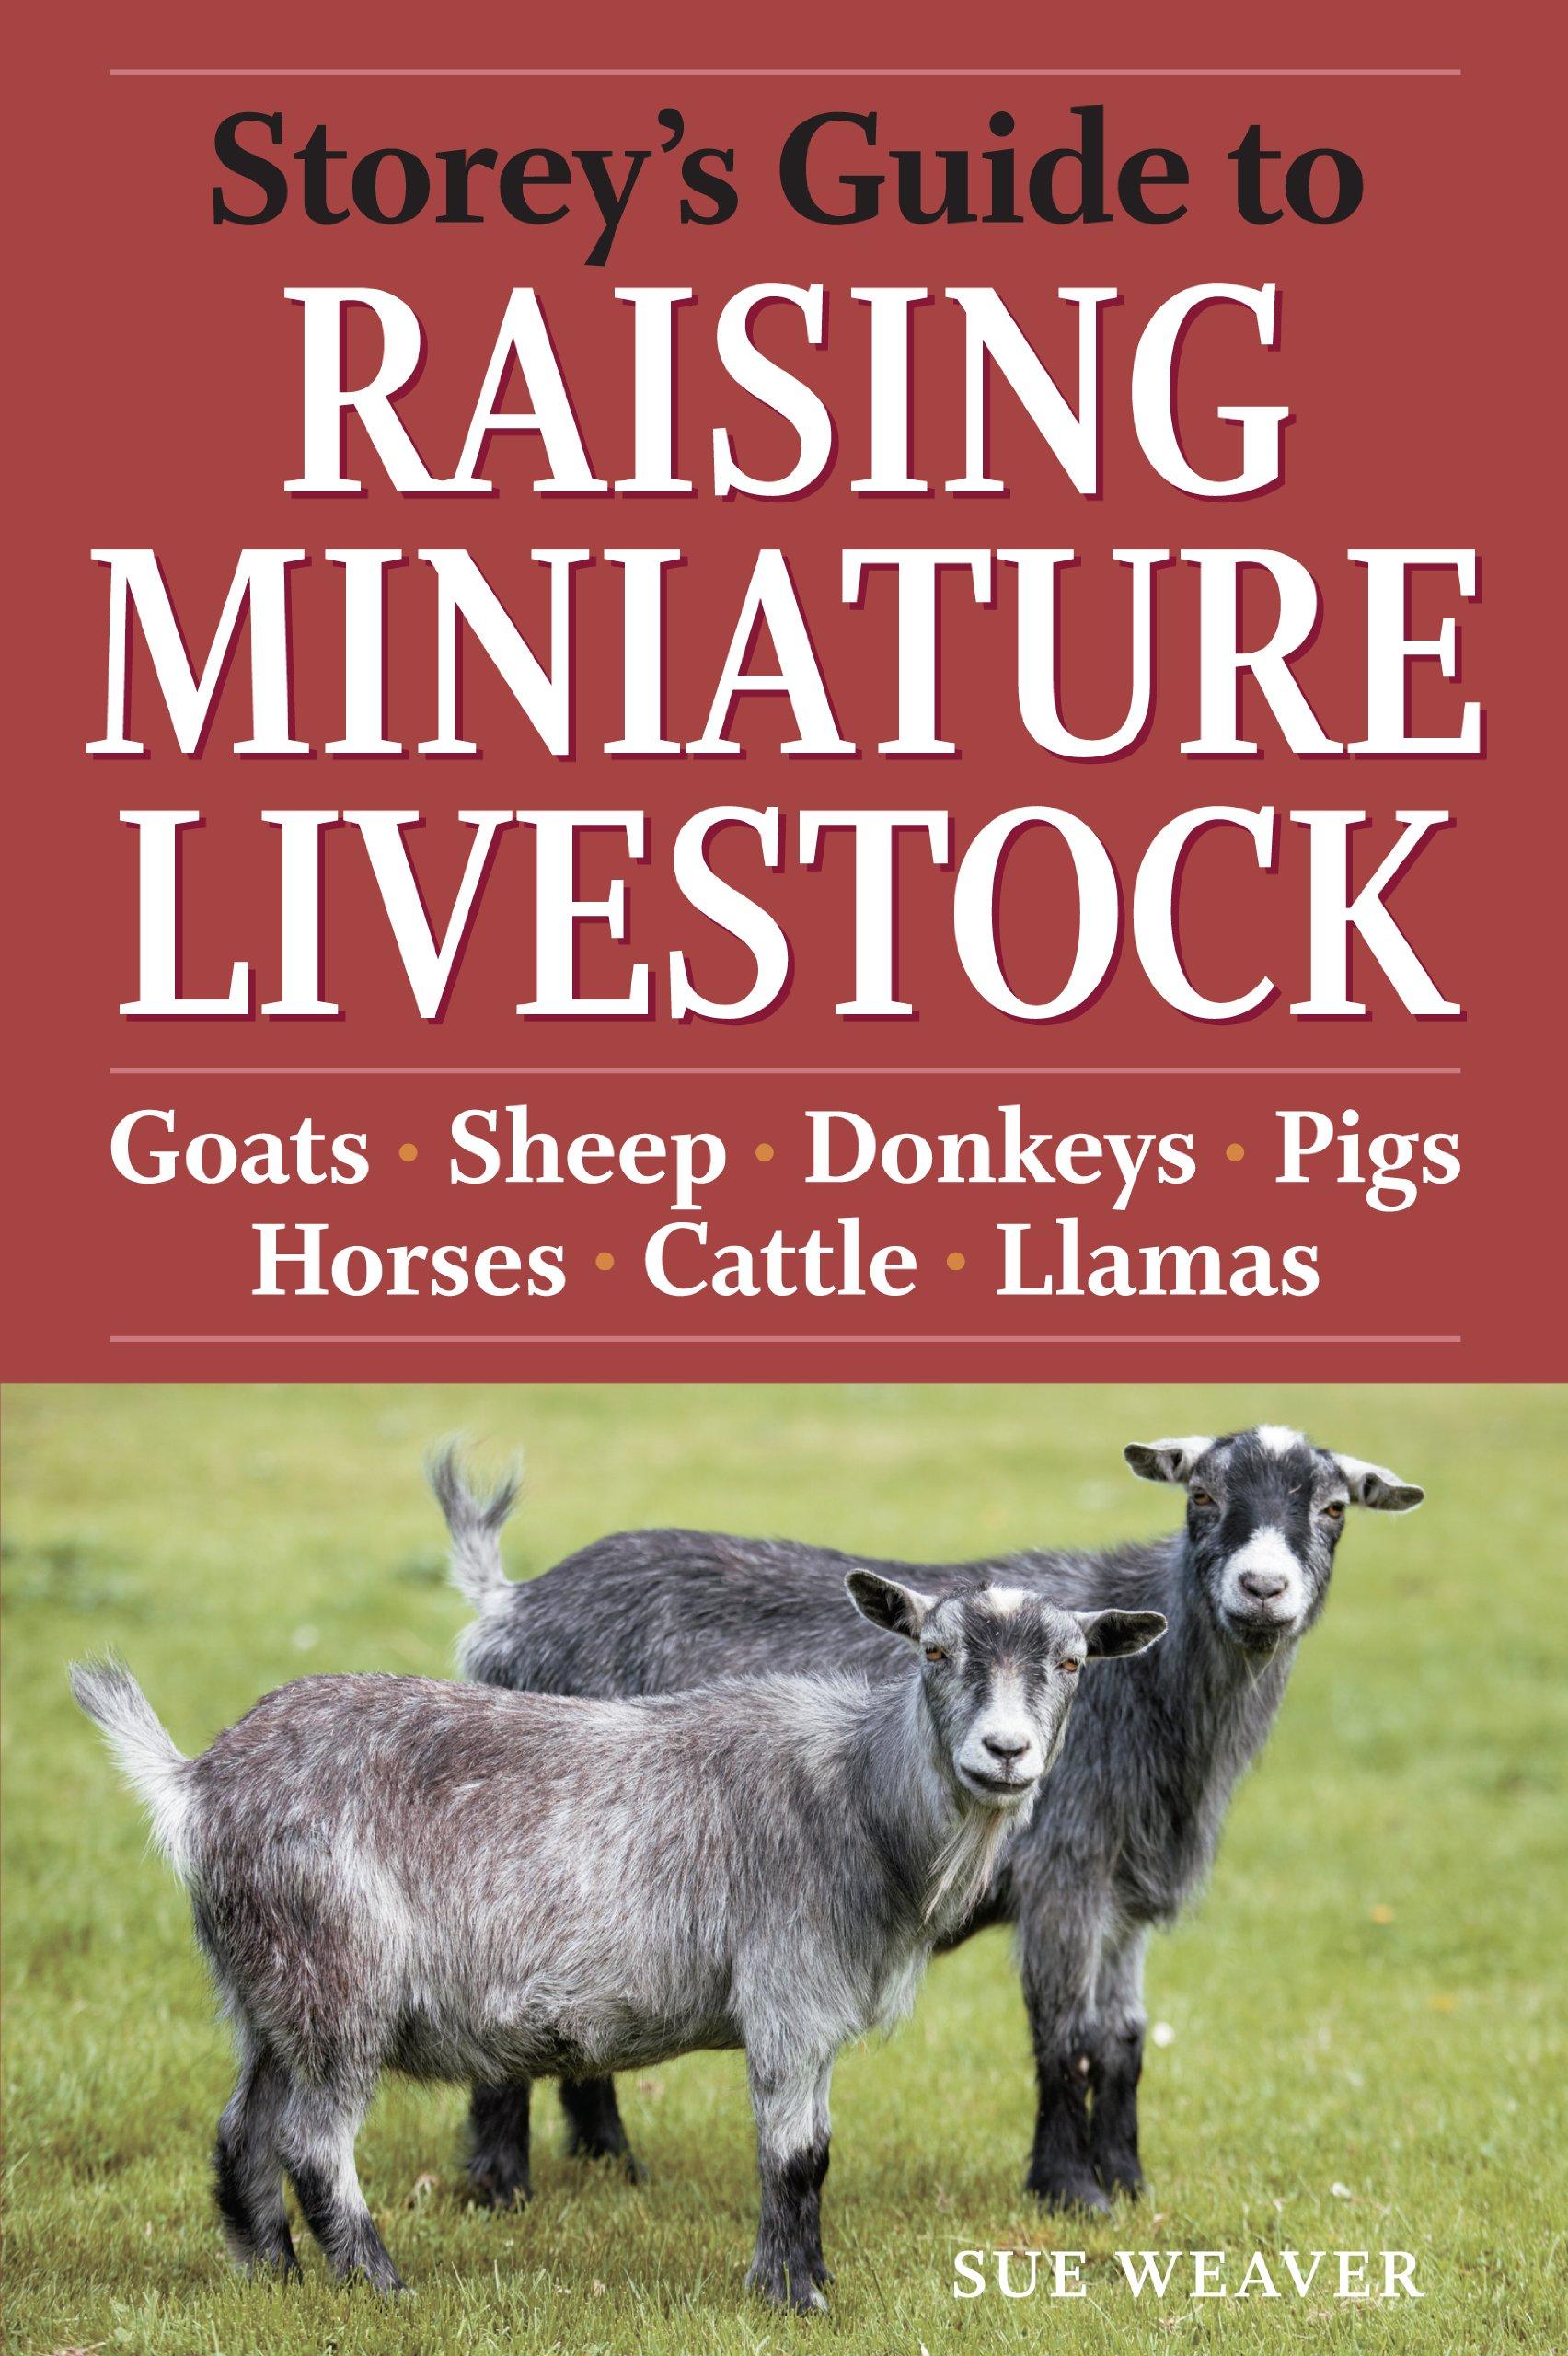 storey u0027s guide to raising miniature livestock goats sheep